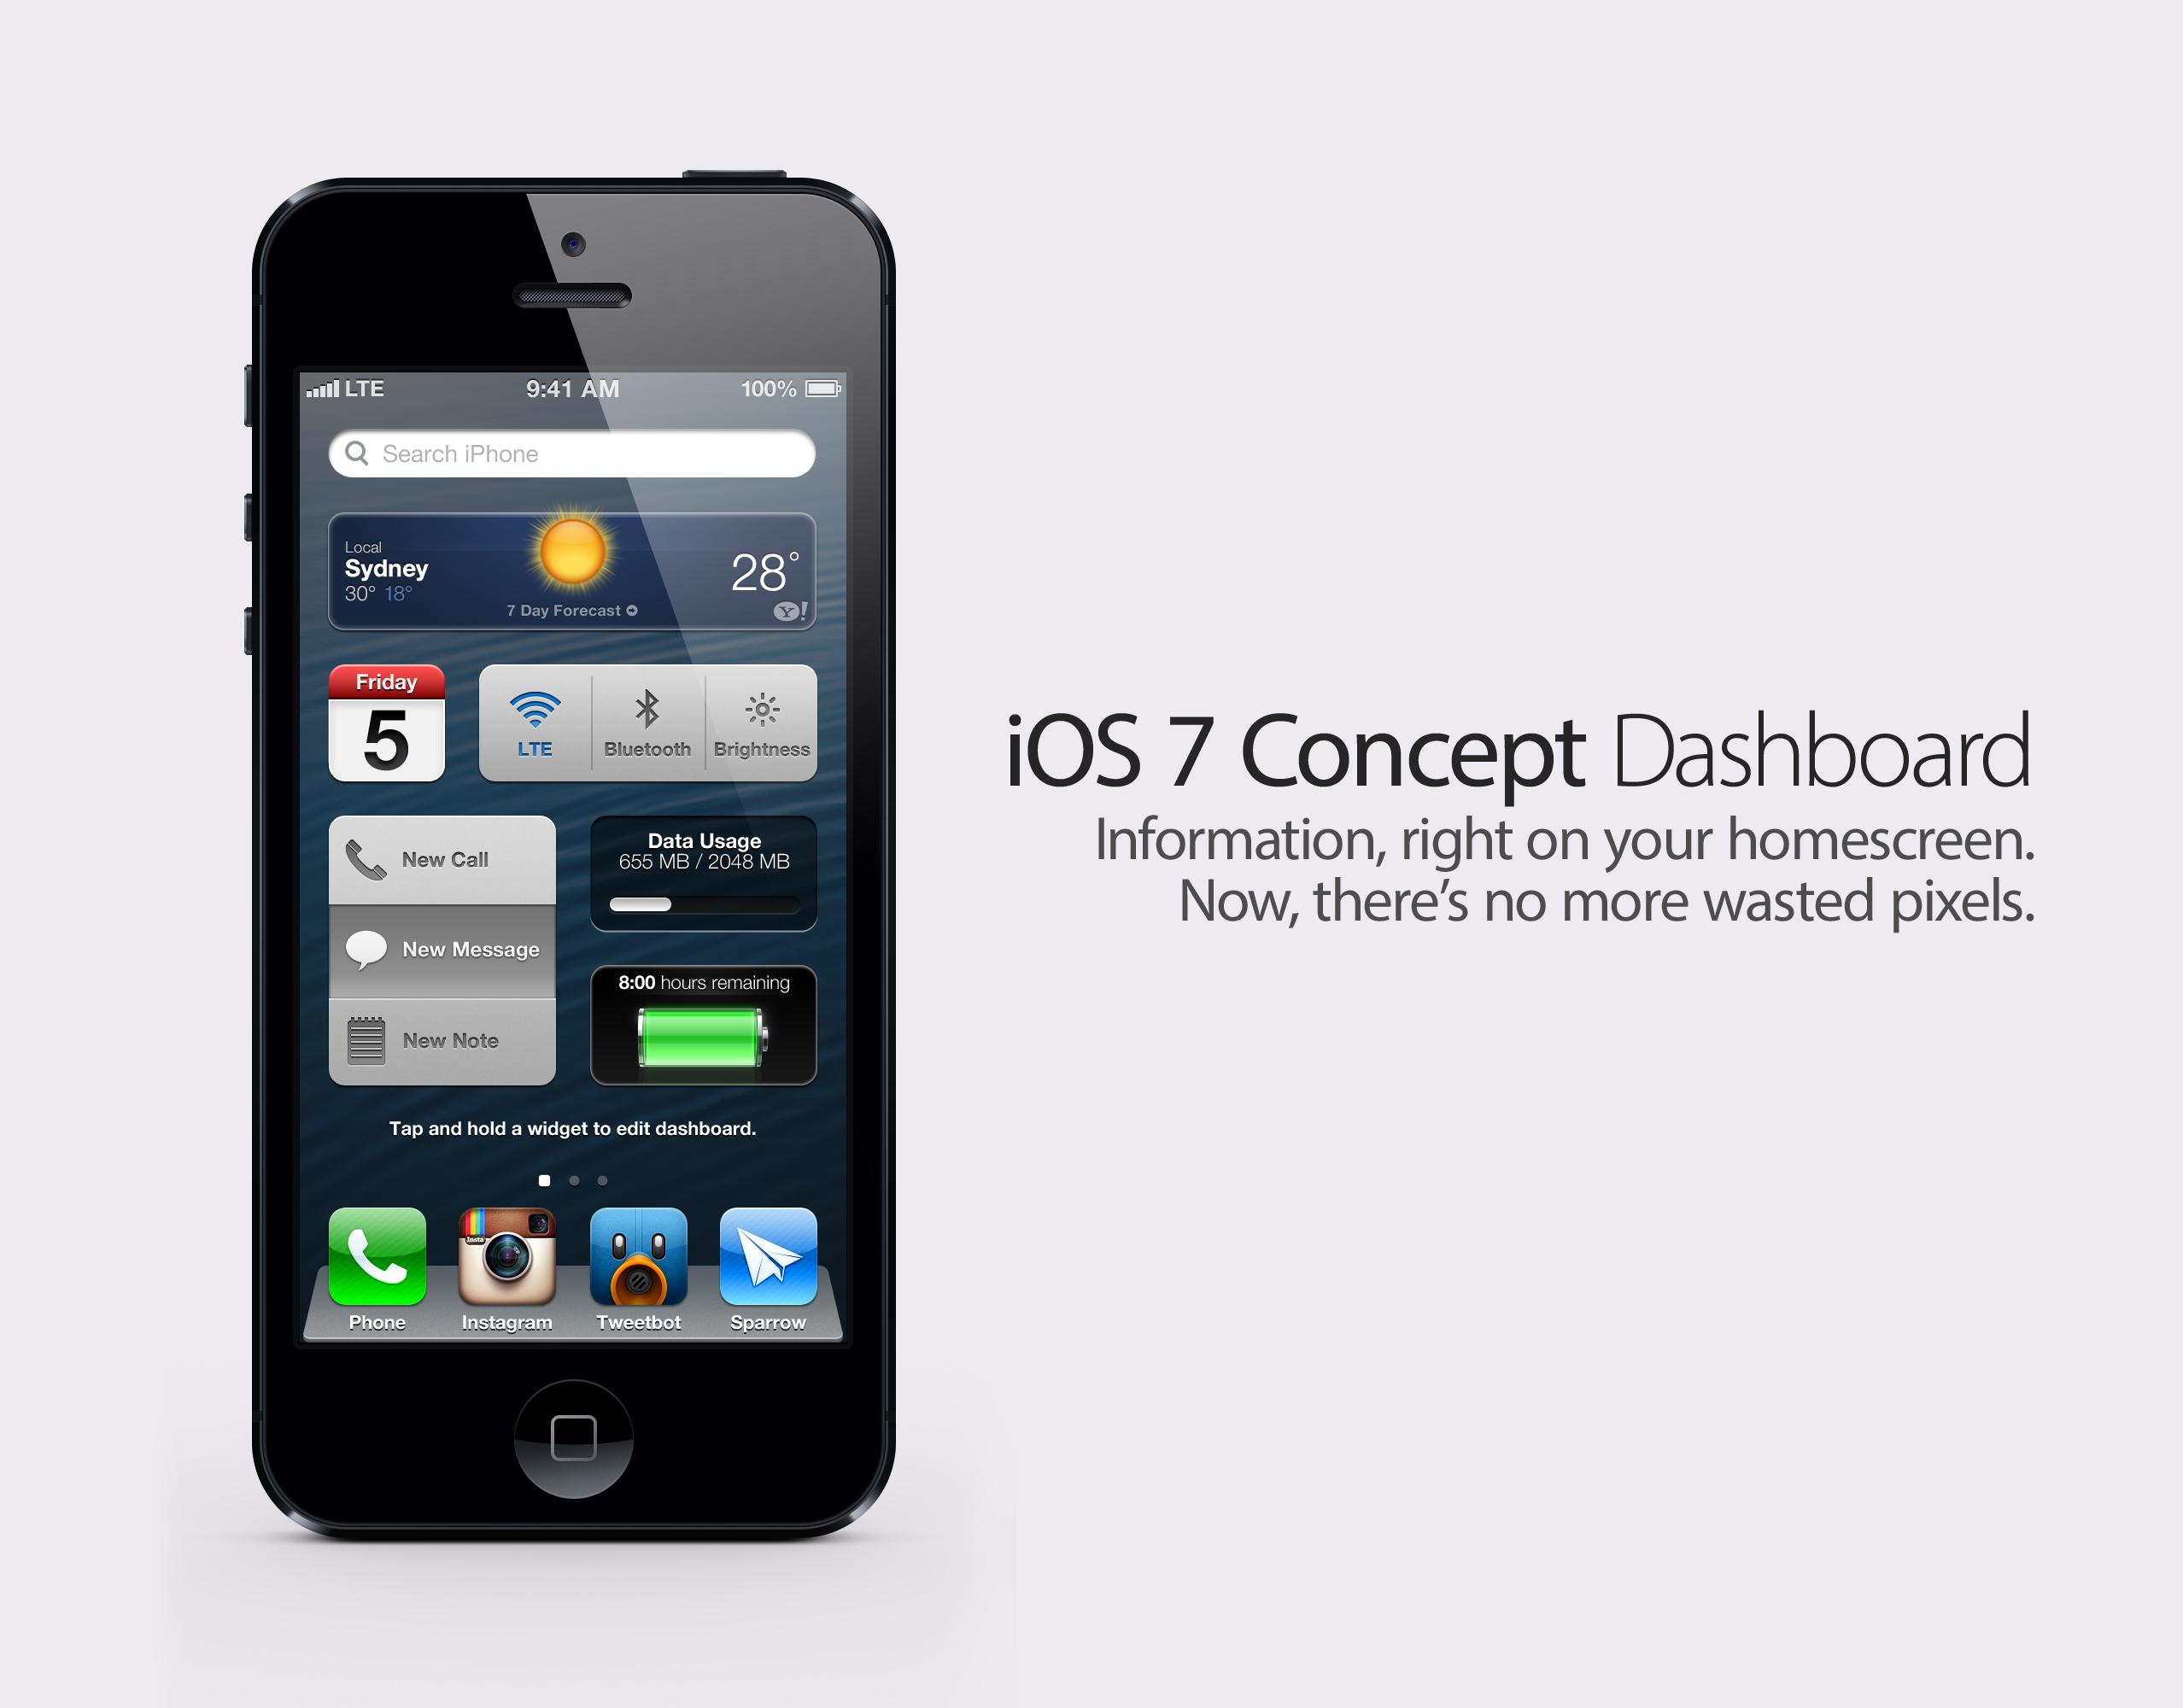 ios_7_concept__dashboard_by_theintenseplayer-d5gzwlt